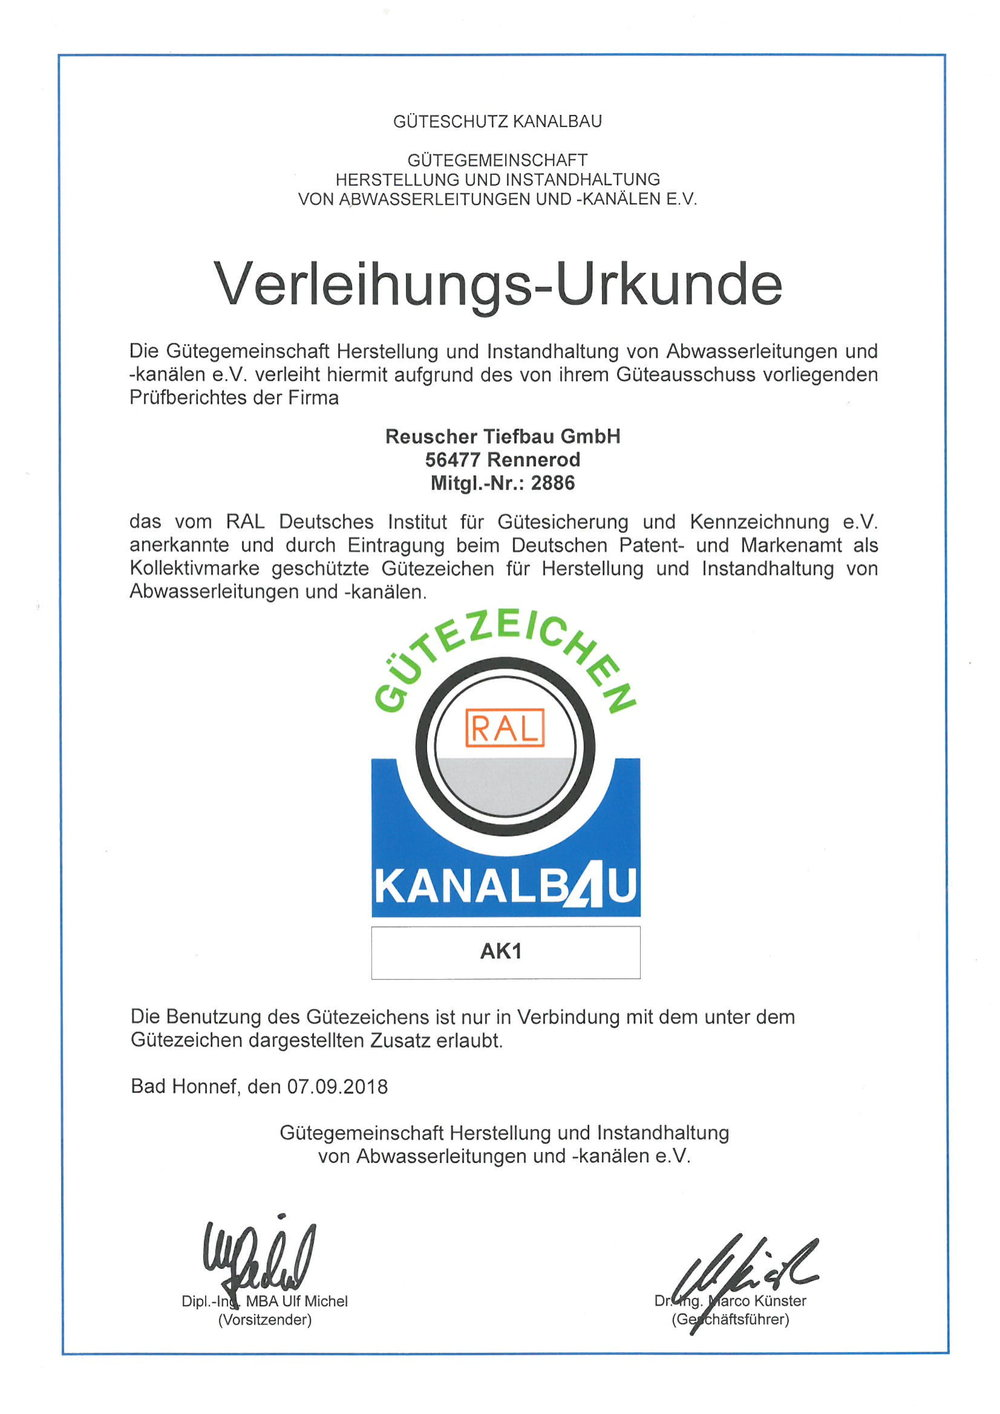 Gütezeichen Kanalbau AK1.jpg